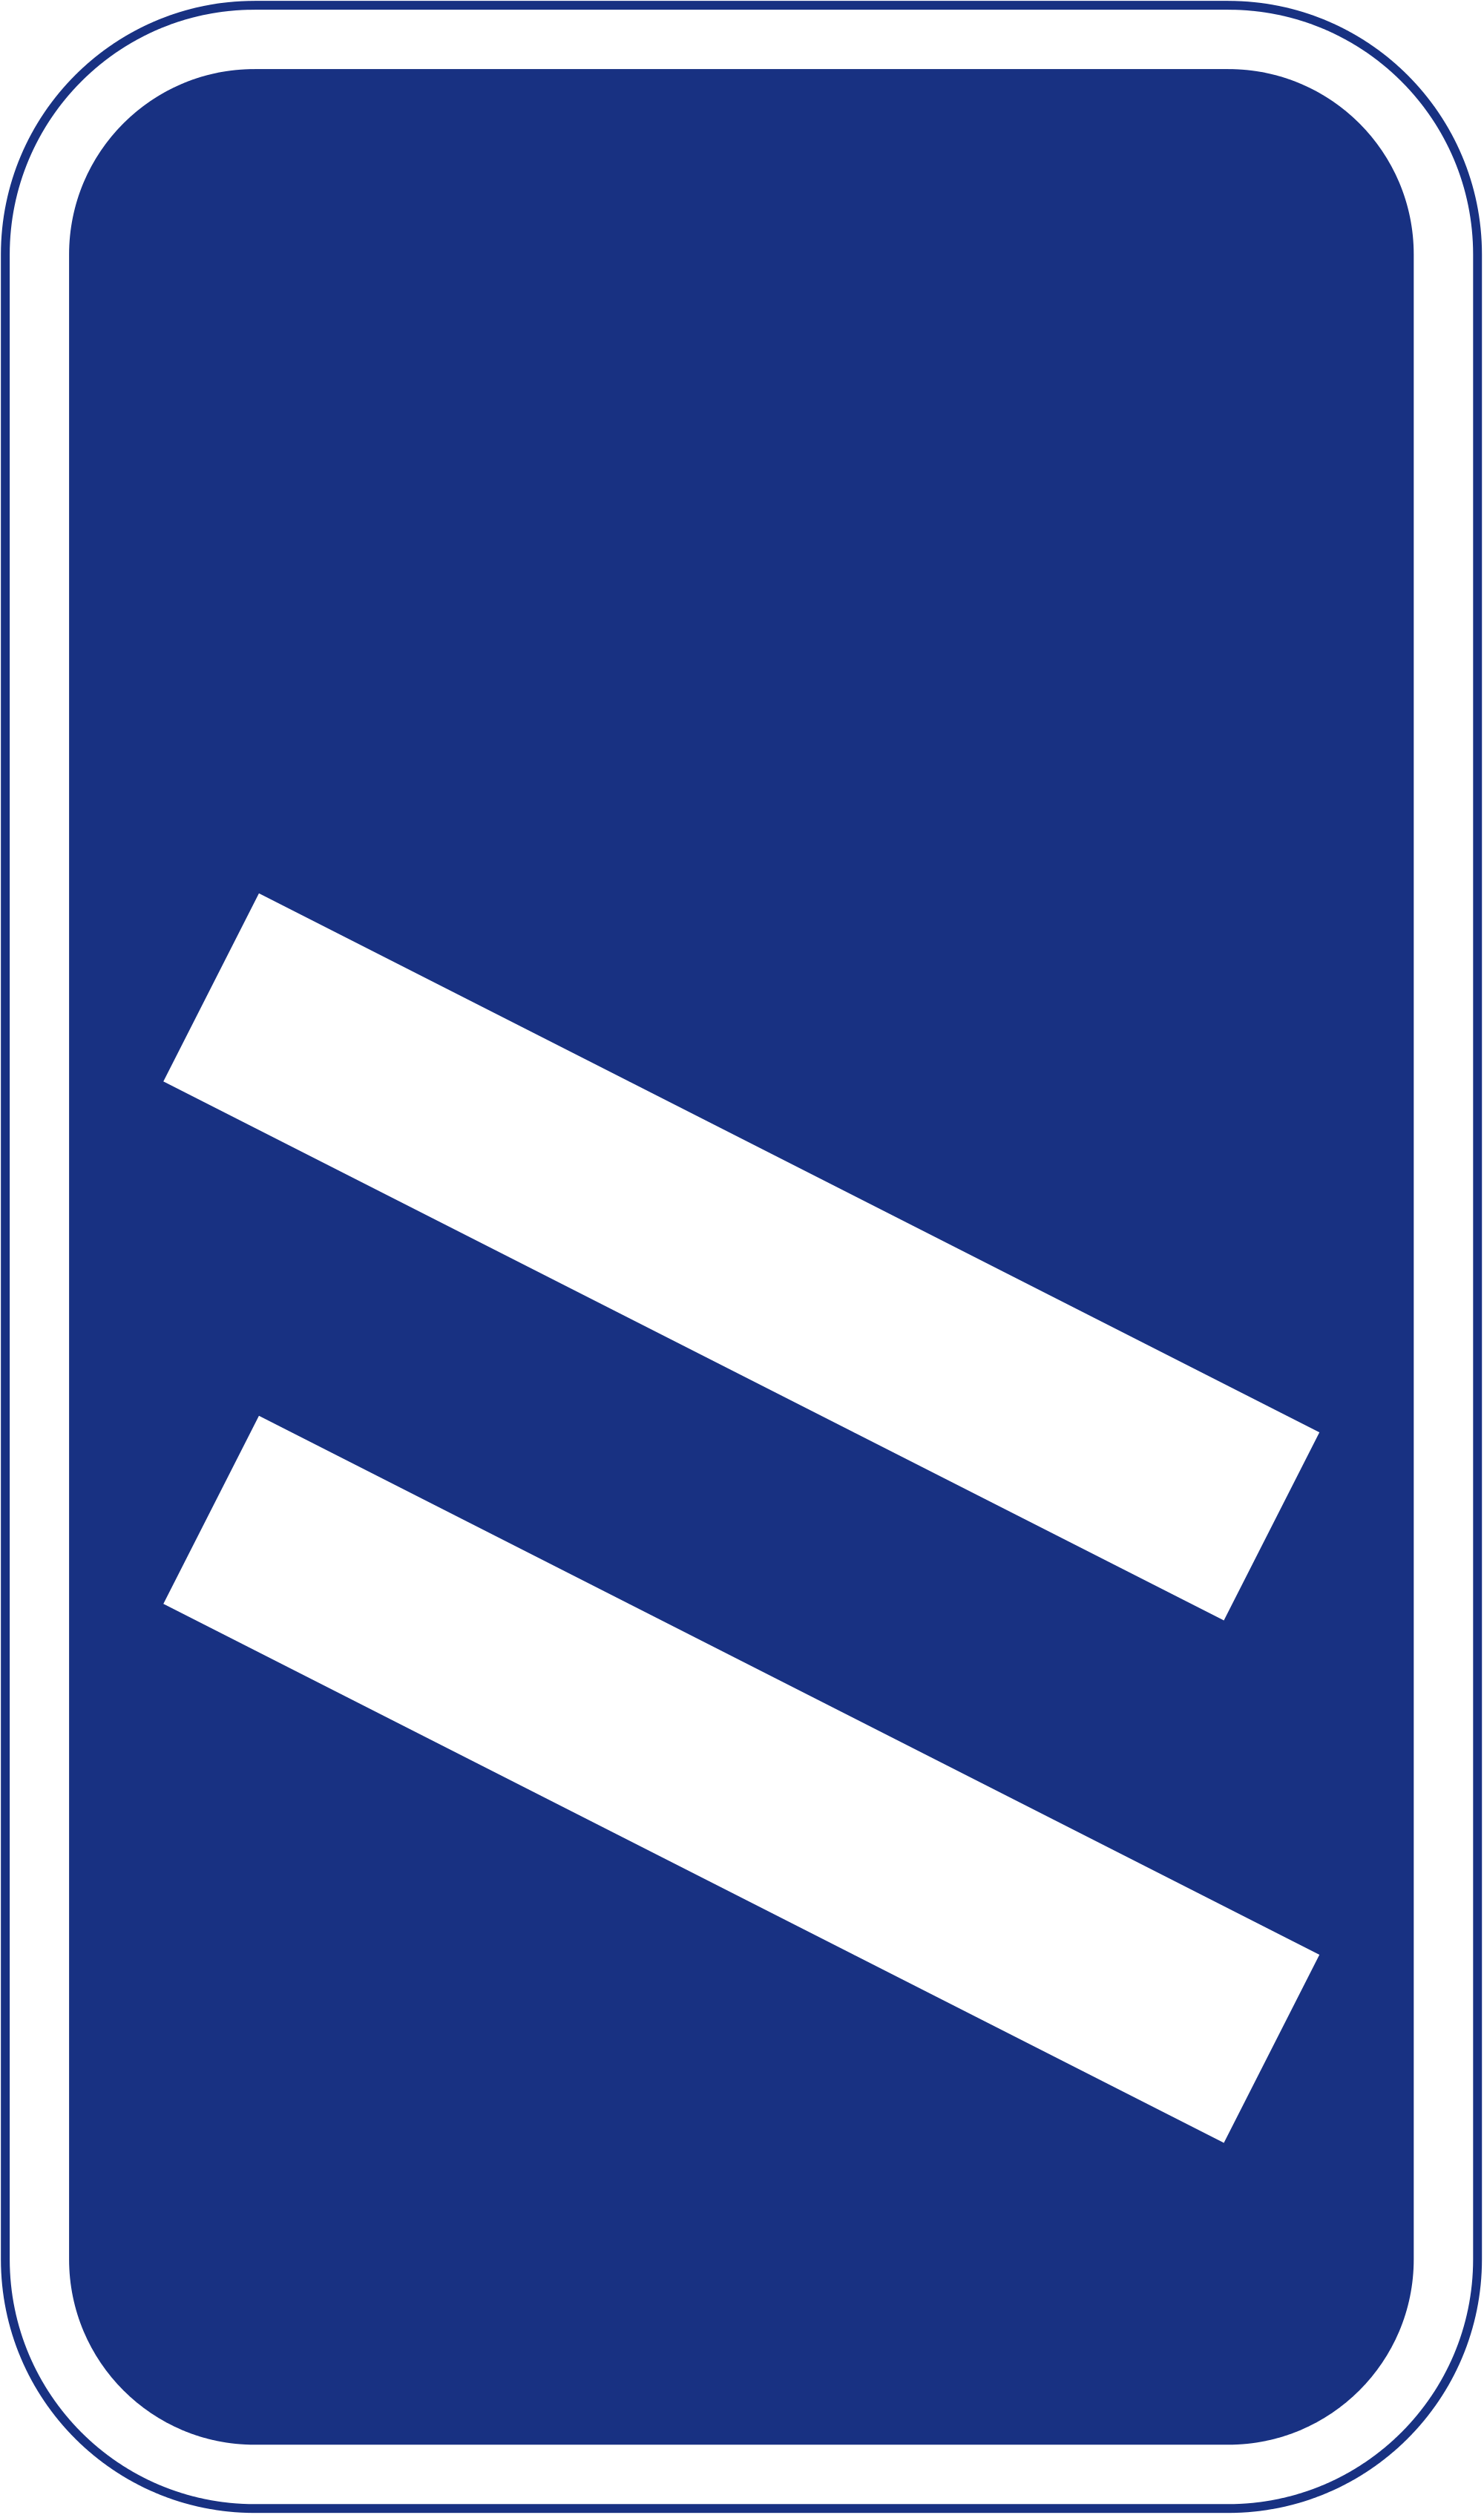 File:Motorway road sign 200m next exit.svg.